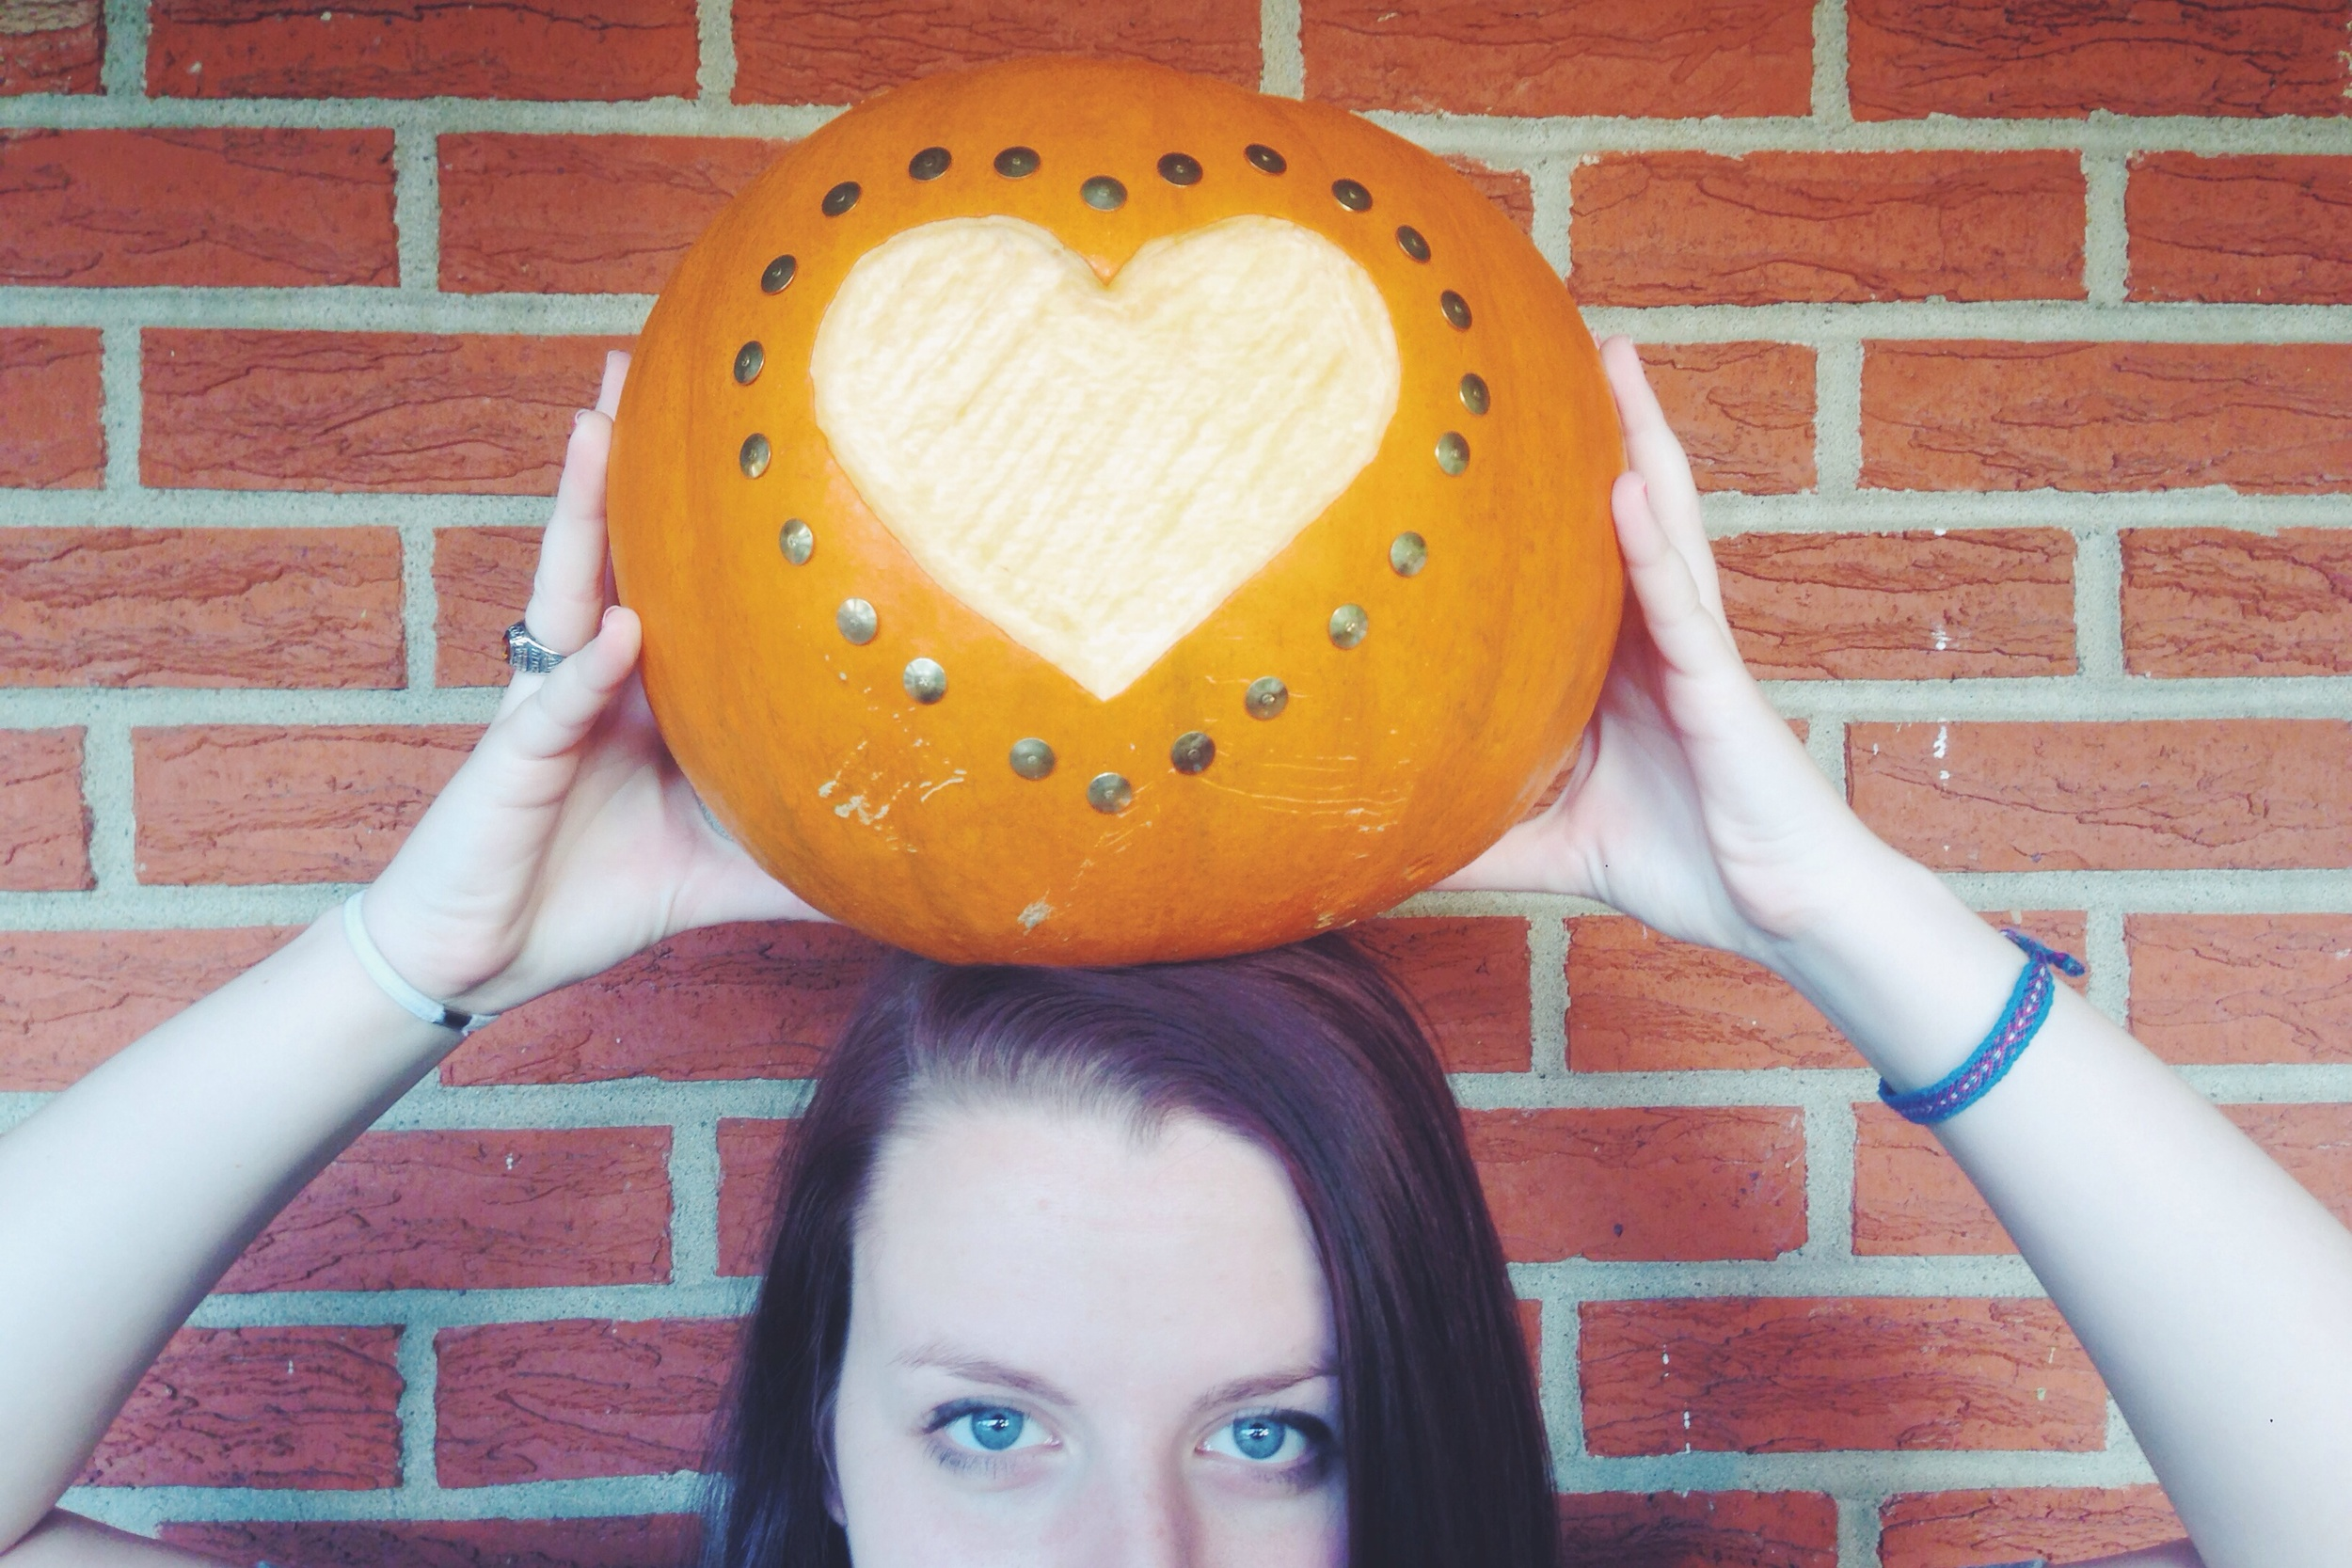 Carving + Decorating Pumpkins. Click through for details.